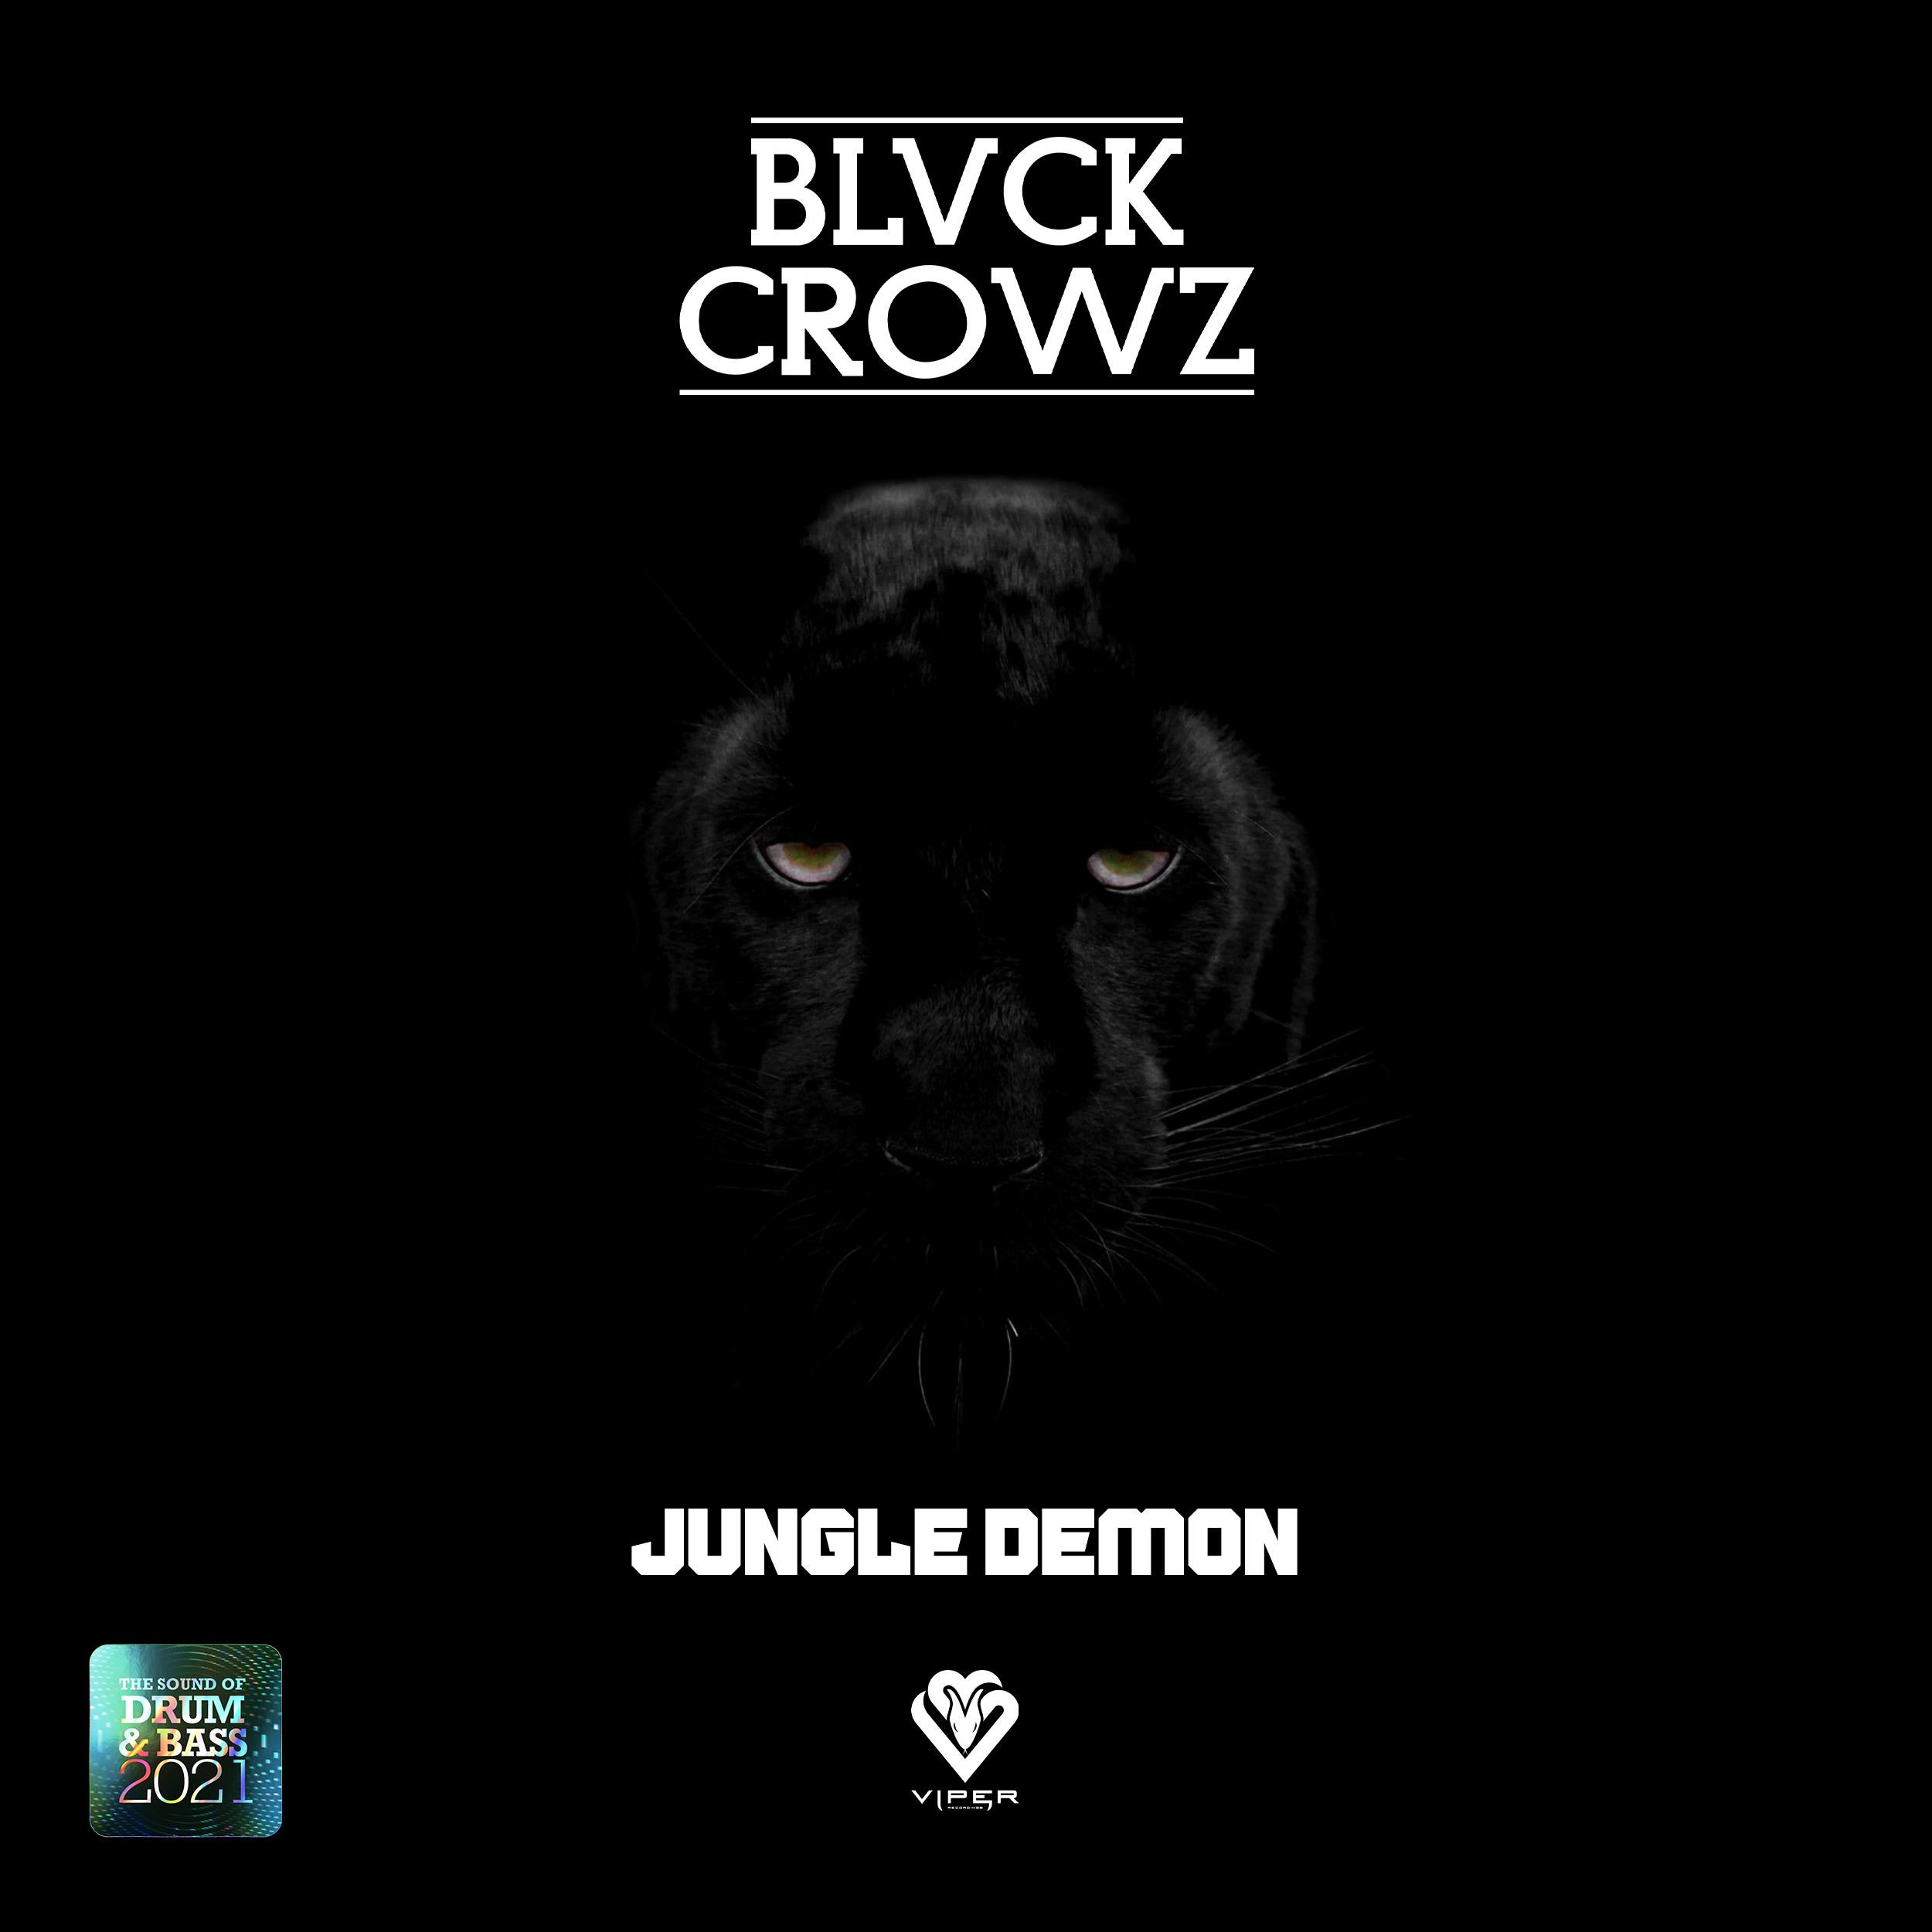 BLVCK CROWZ - Jungle Demon [VPR239]